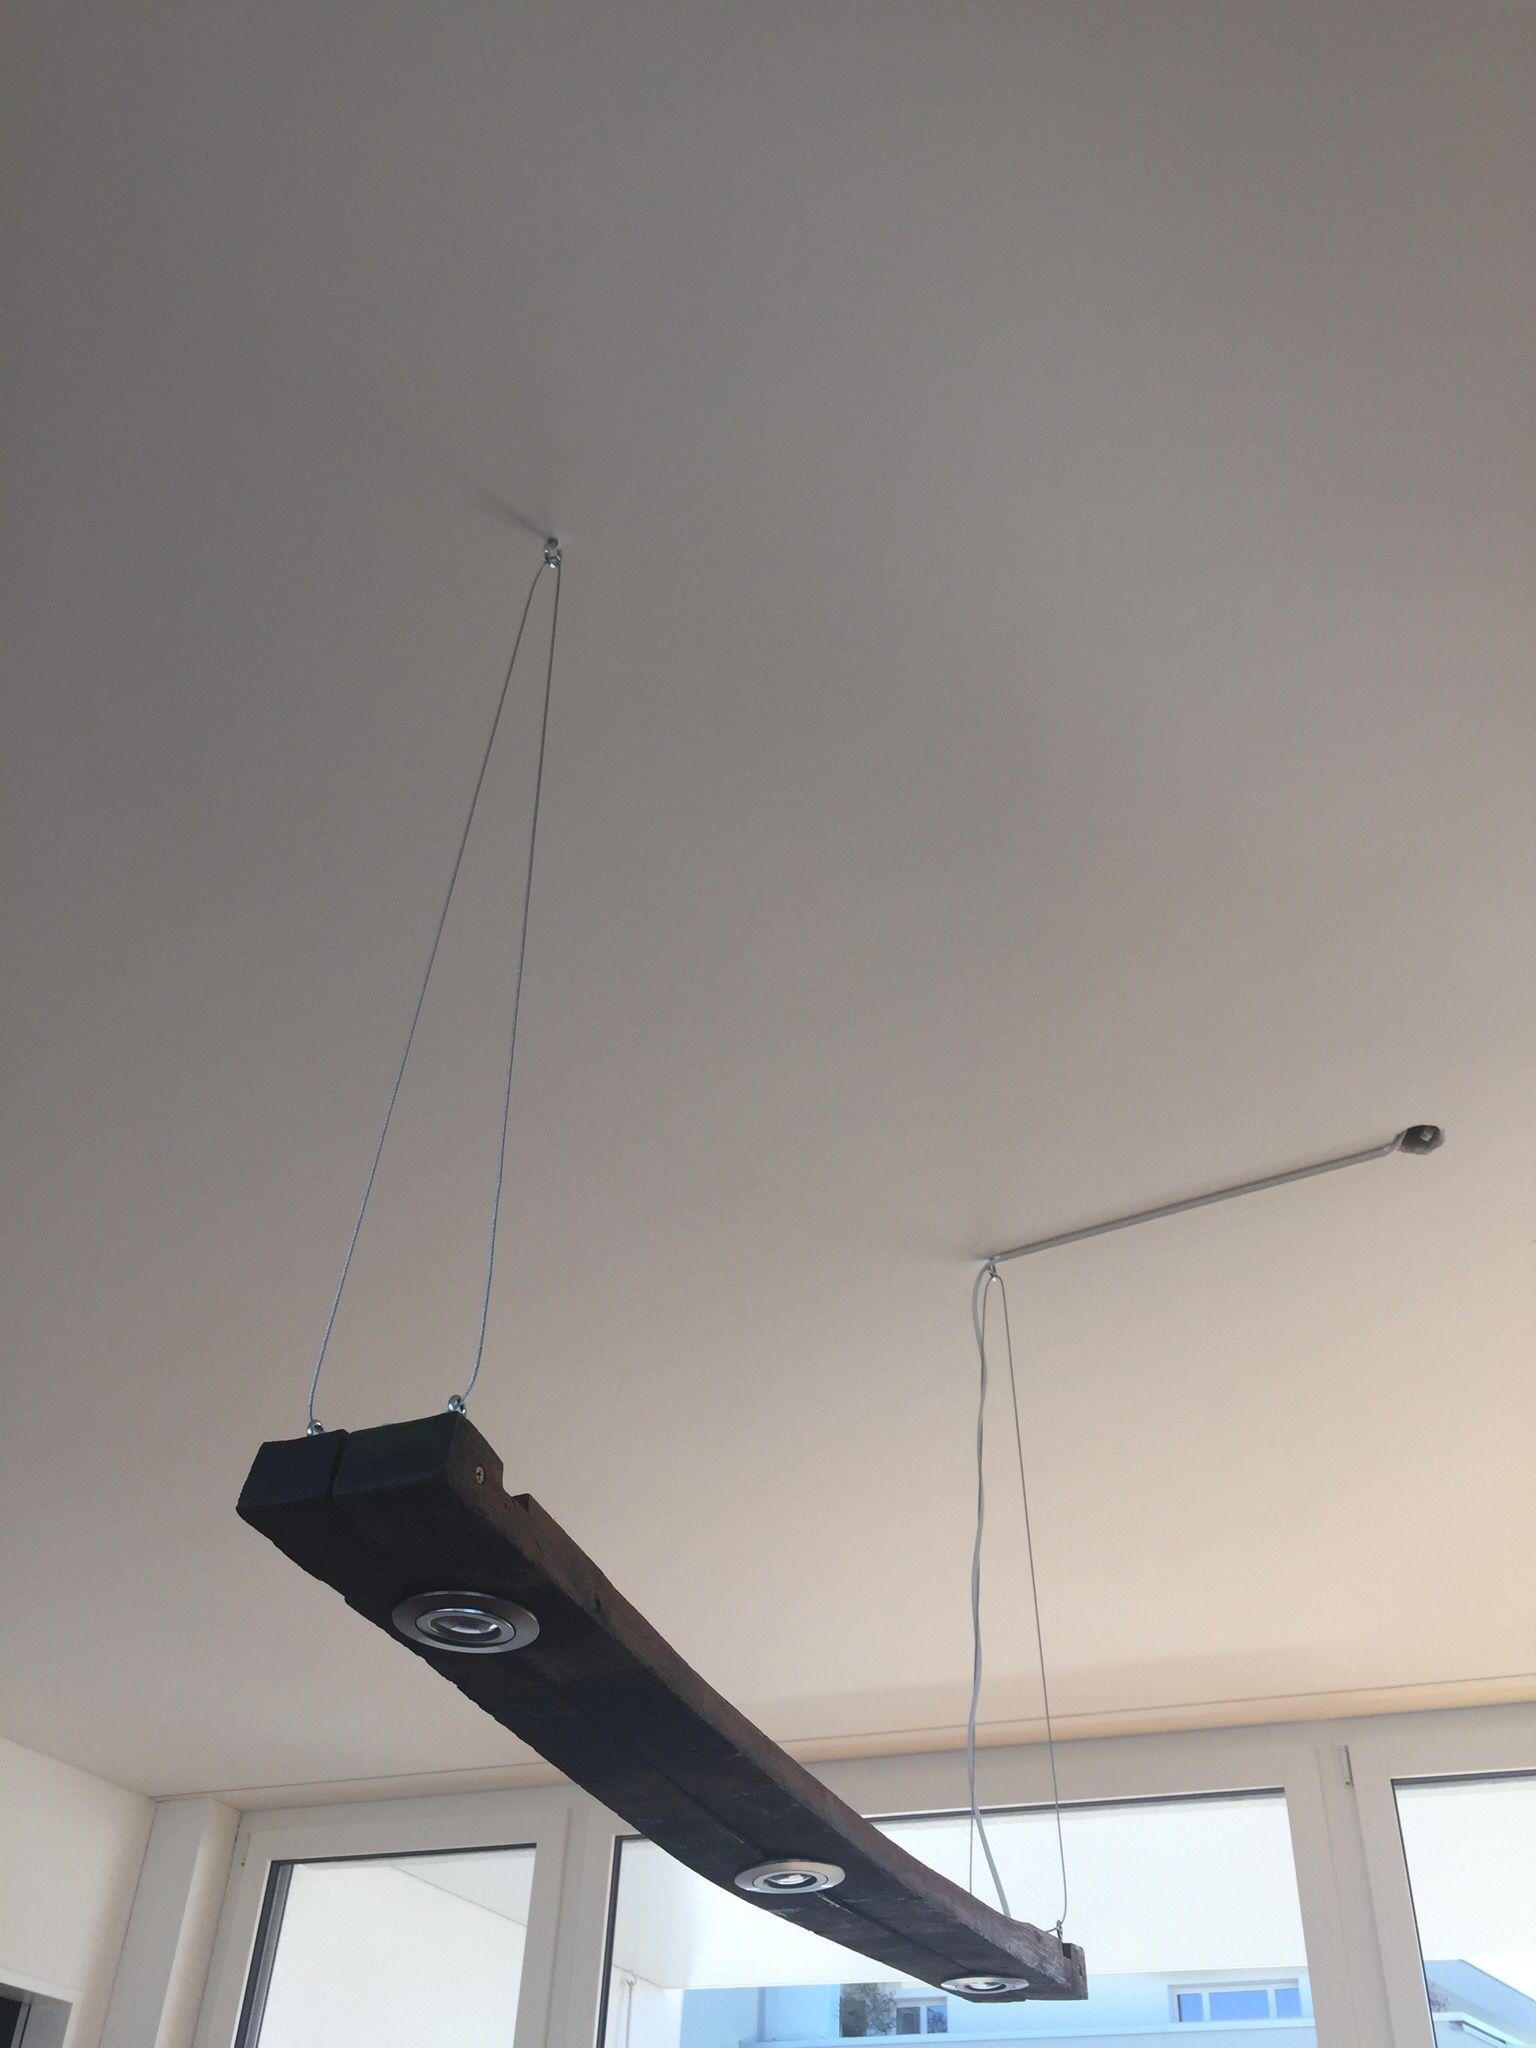 Wooden Lamp Made Out Of Barrel Staves With Led Lighting Holzlampe Aus Fassdauben Mit Led Leuchten Holzleuchte Fassdauben Weinfass